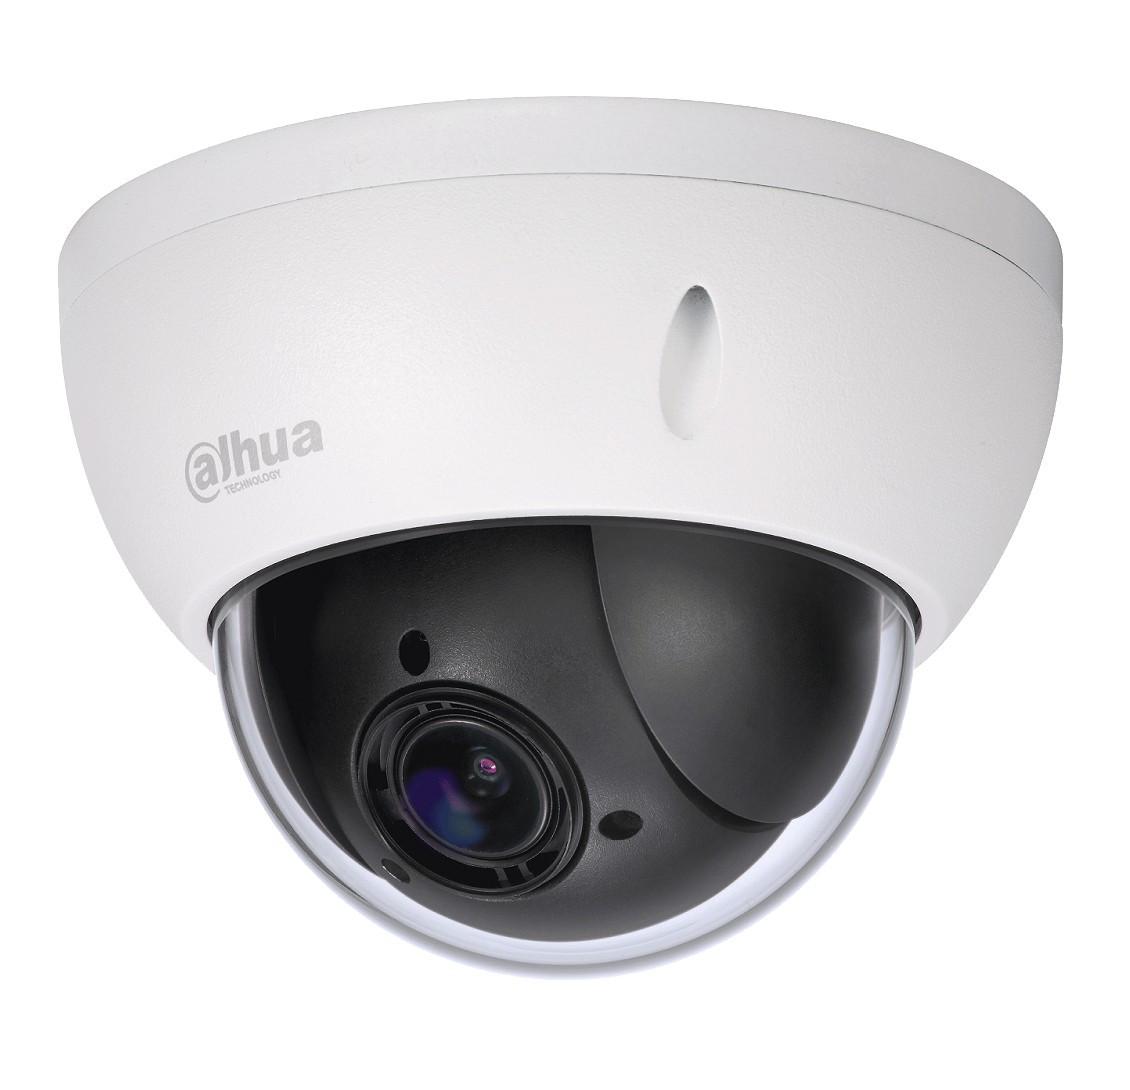 IP-видеокамера Speed Dome 2 Мп Dahua DH-SD22204T-GN